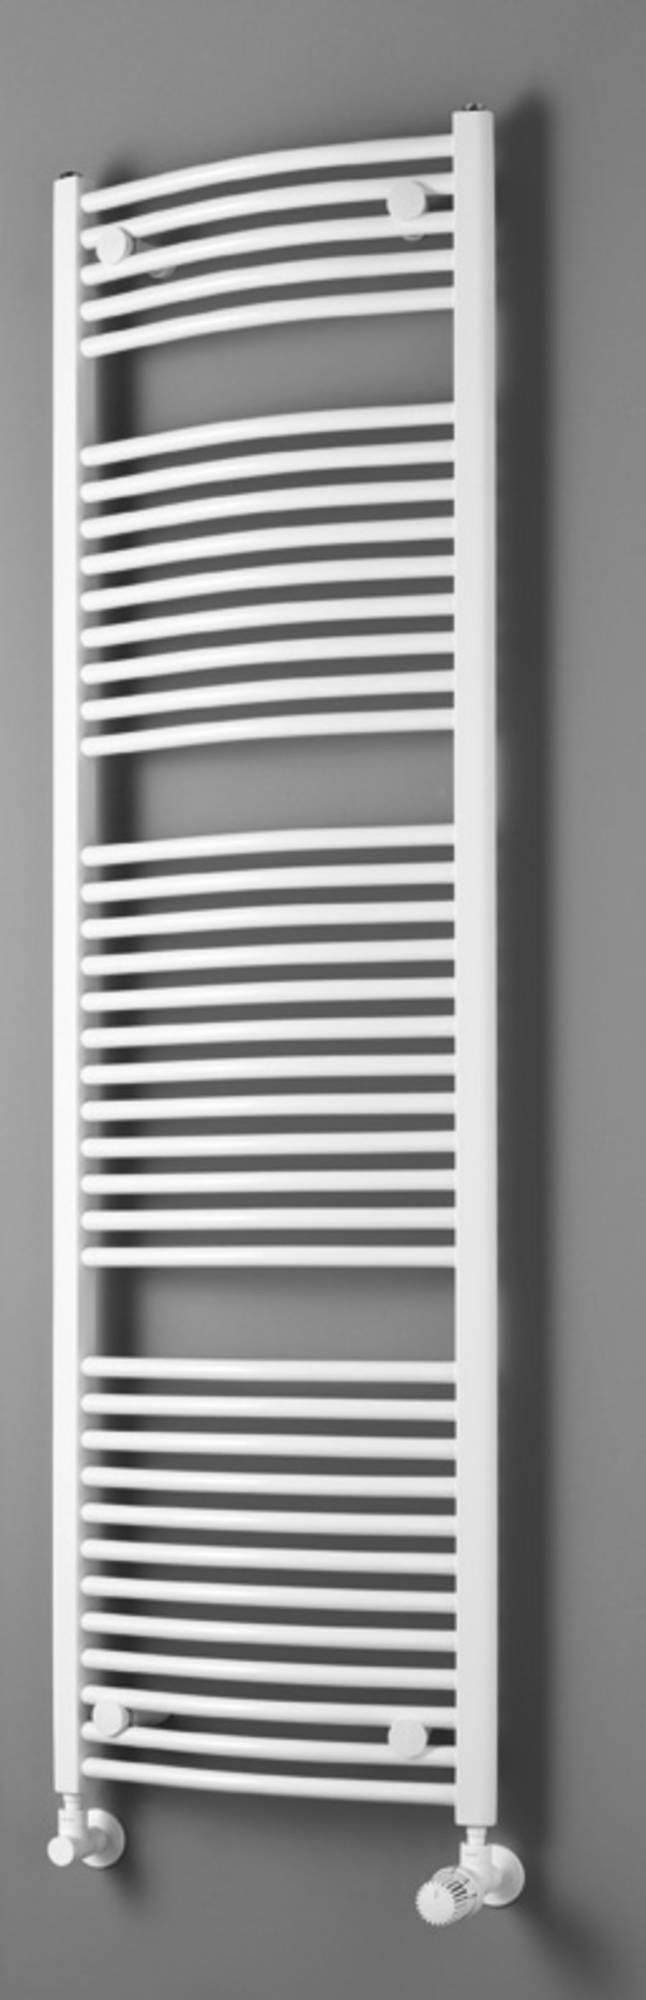 Ben Samos Designradiator 50x77,5cm 389watt Wit